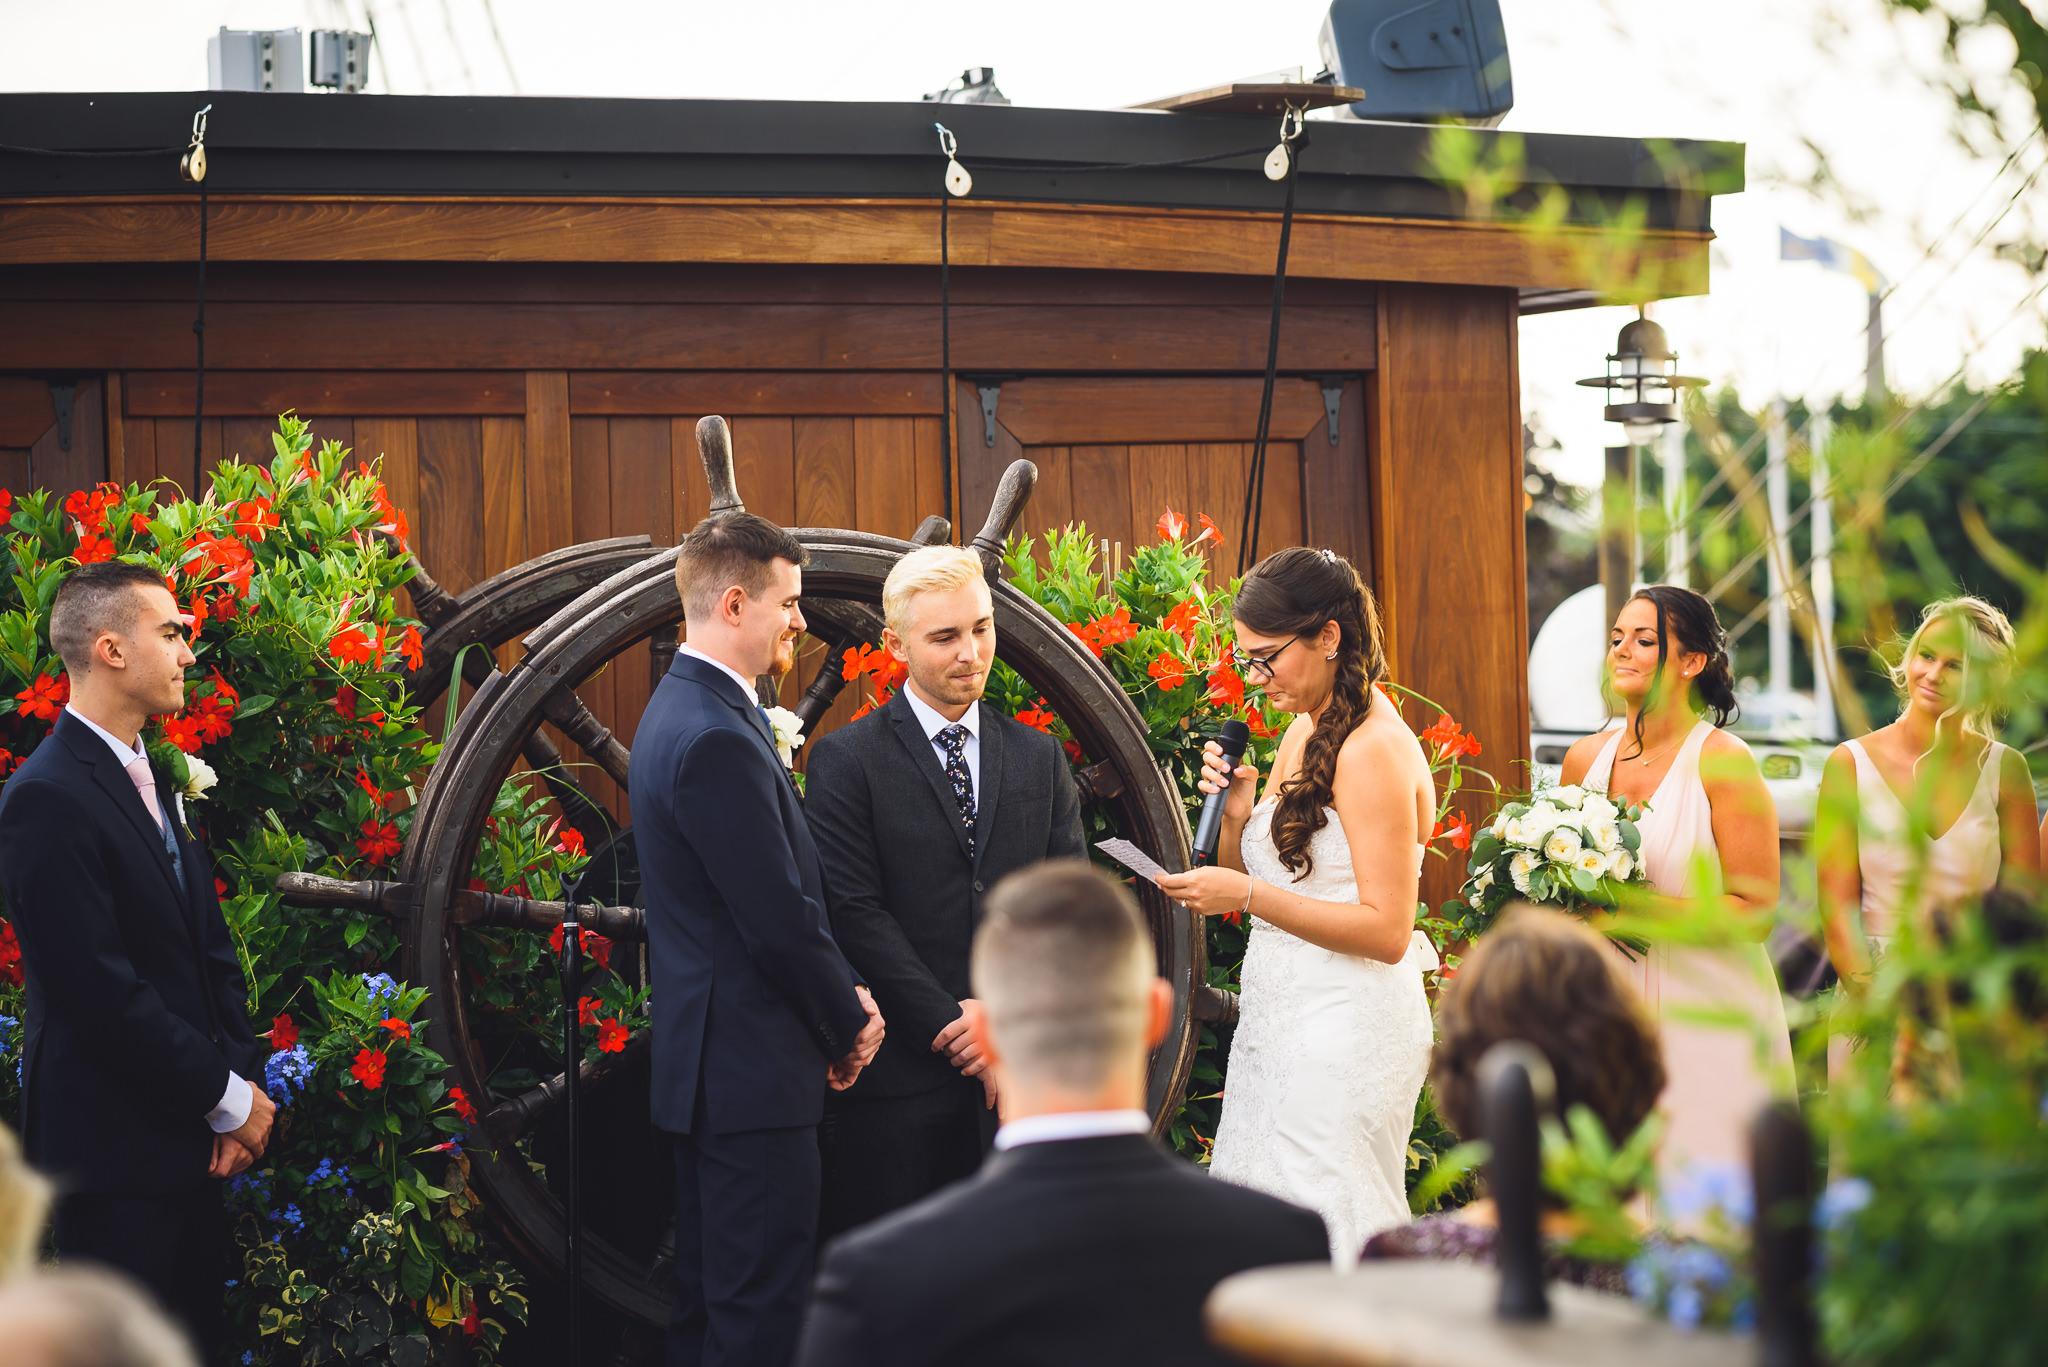 Wedding at the Moshulu